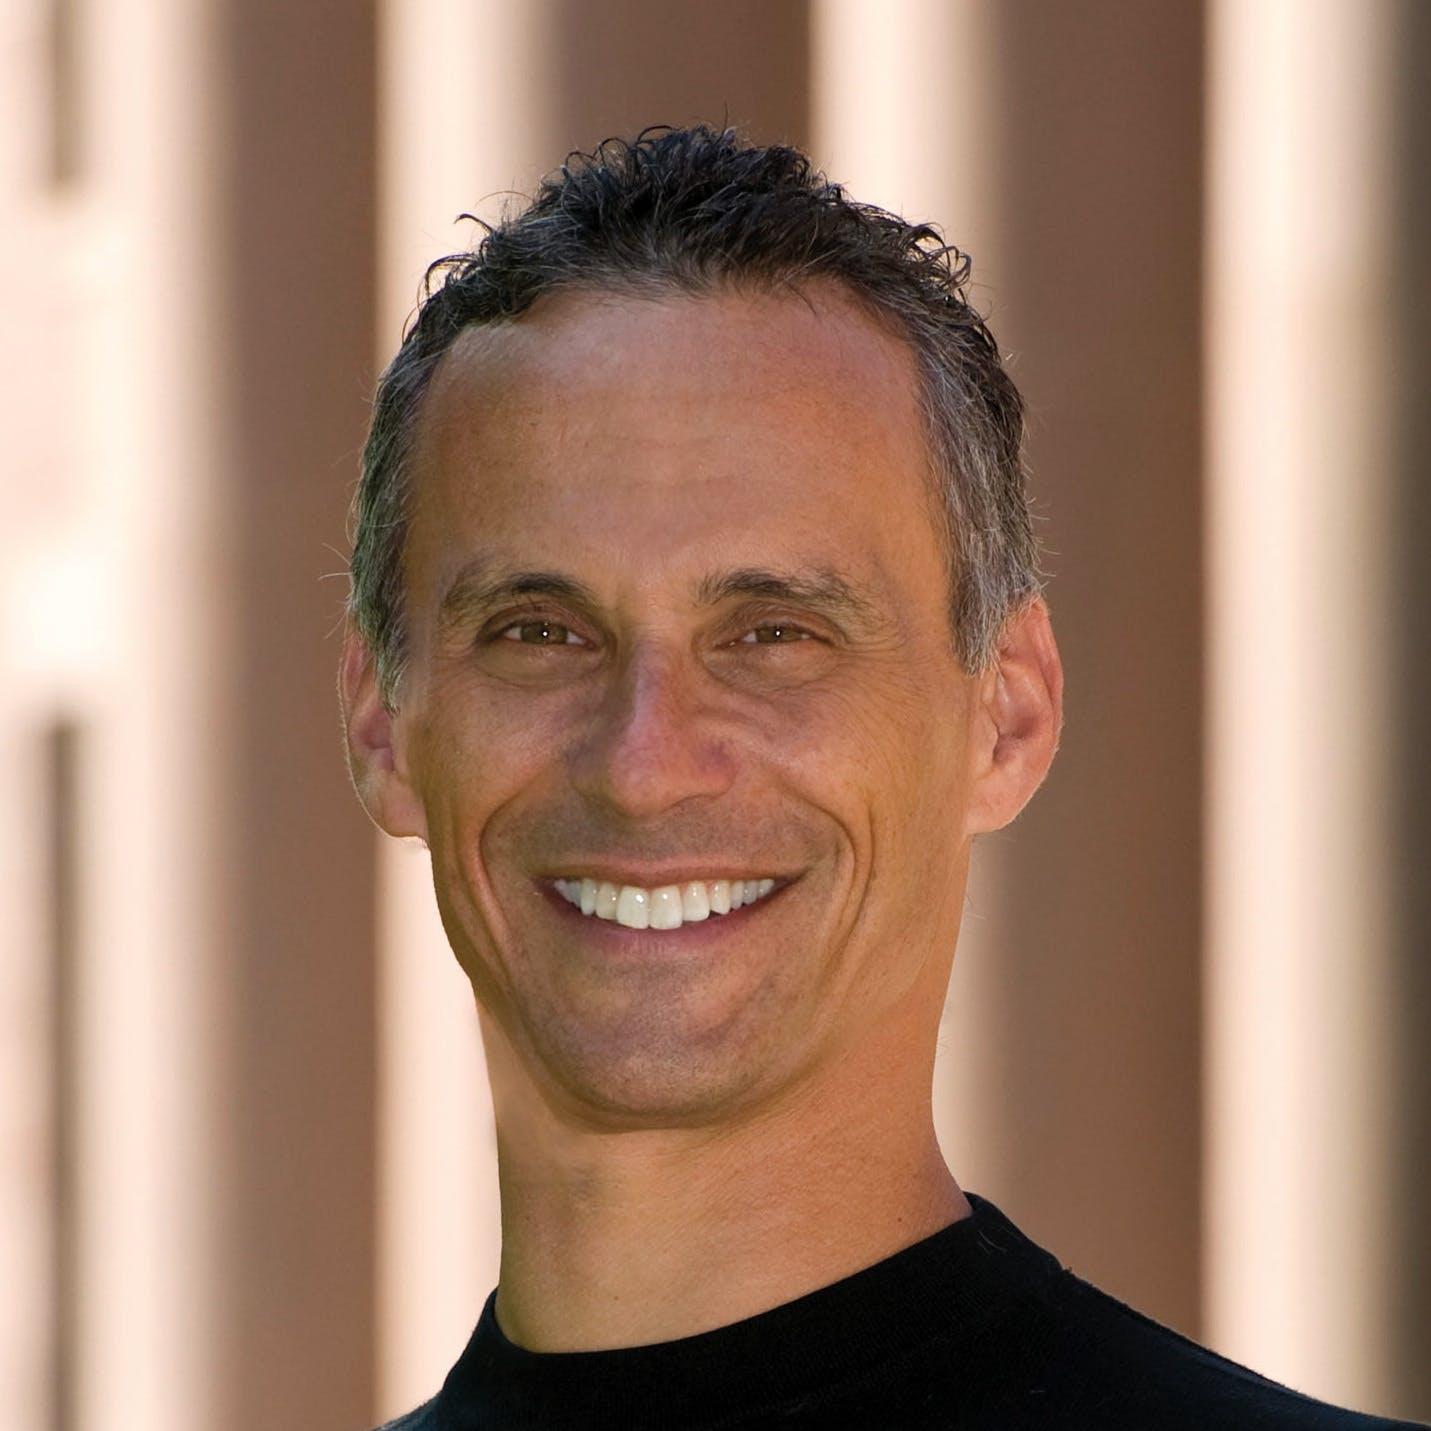 Michael S. Roth